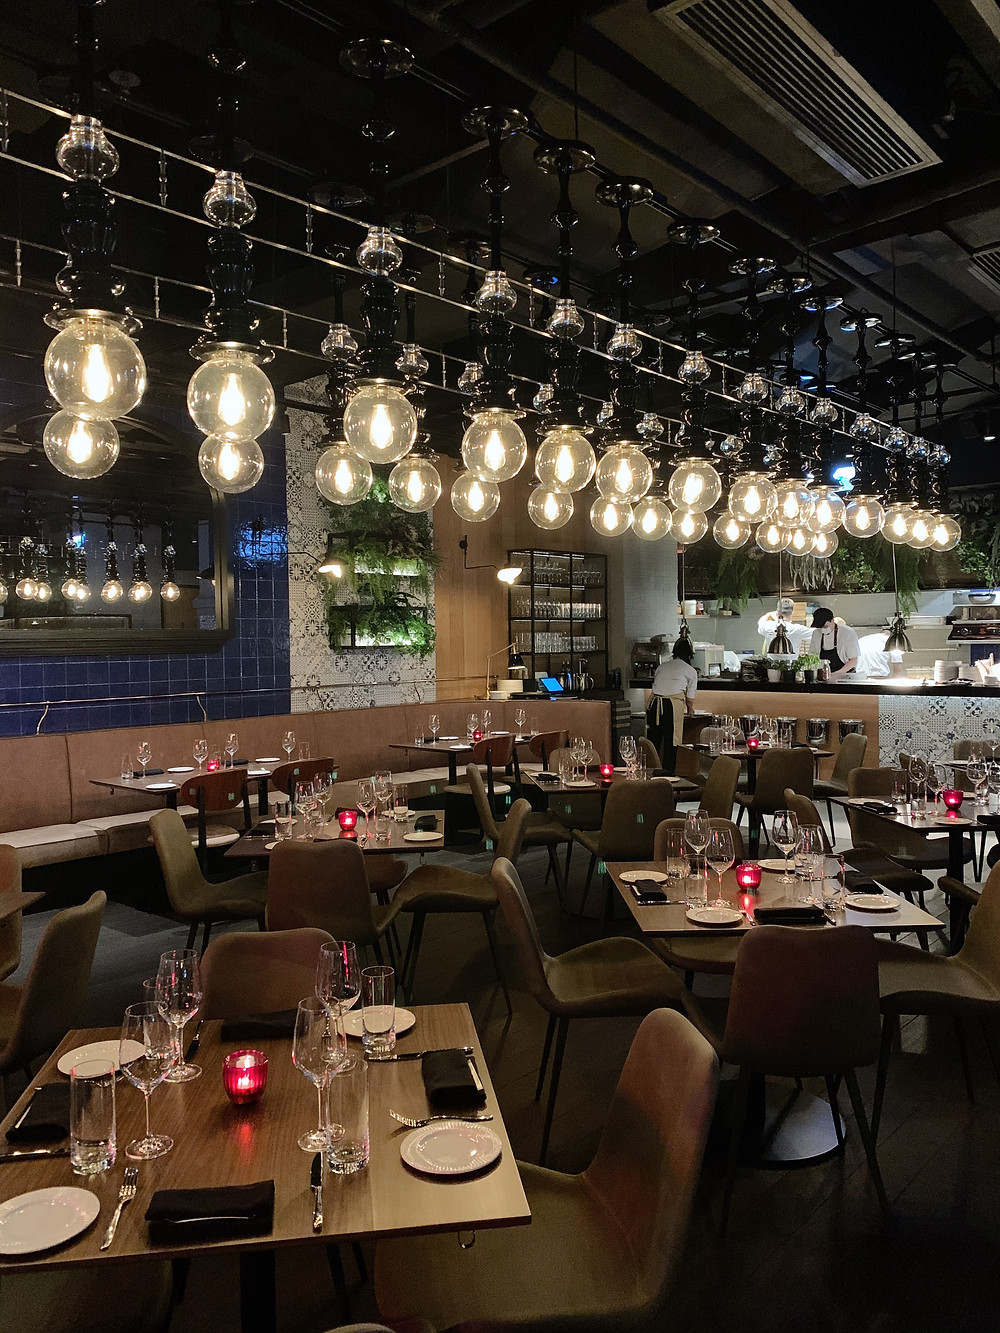 Interiors at Fiamma Italian restaurant in Hong Kong